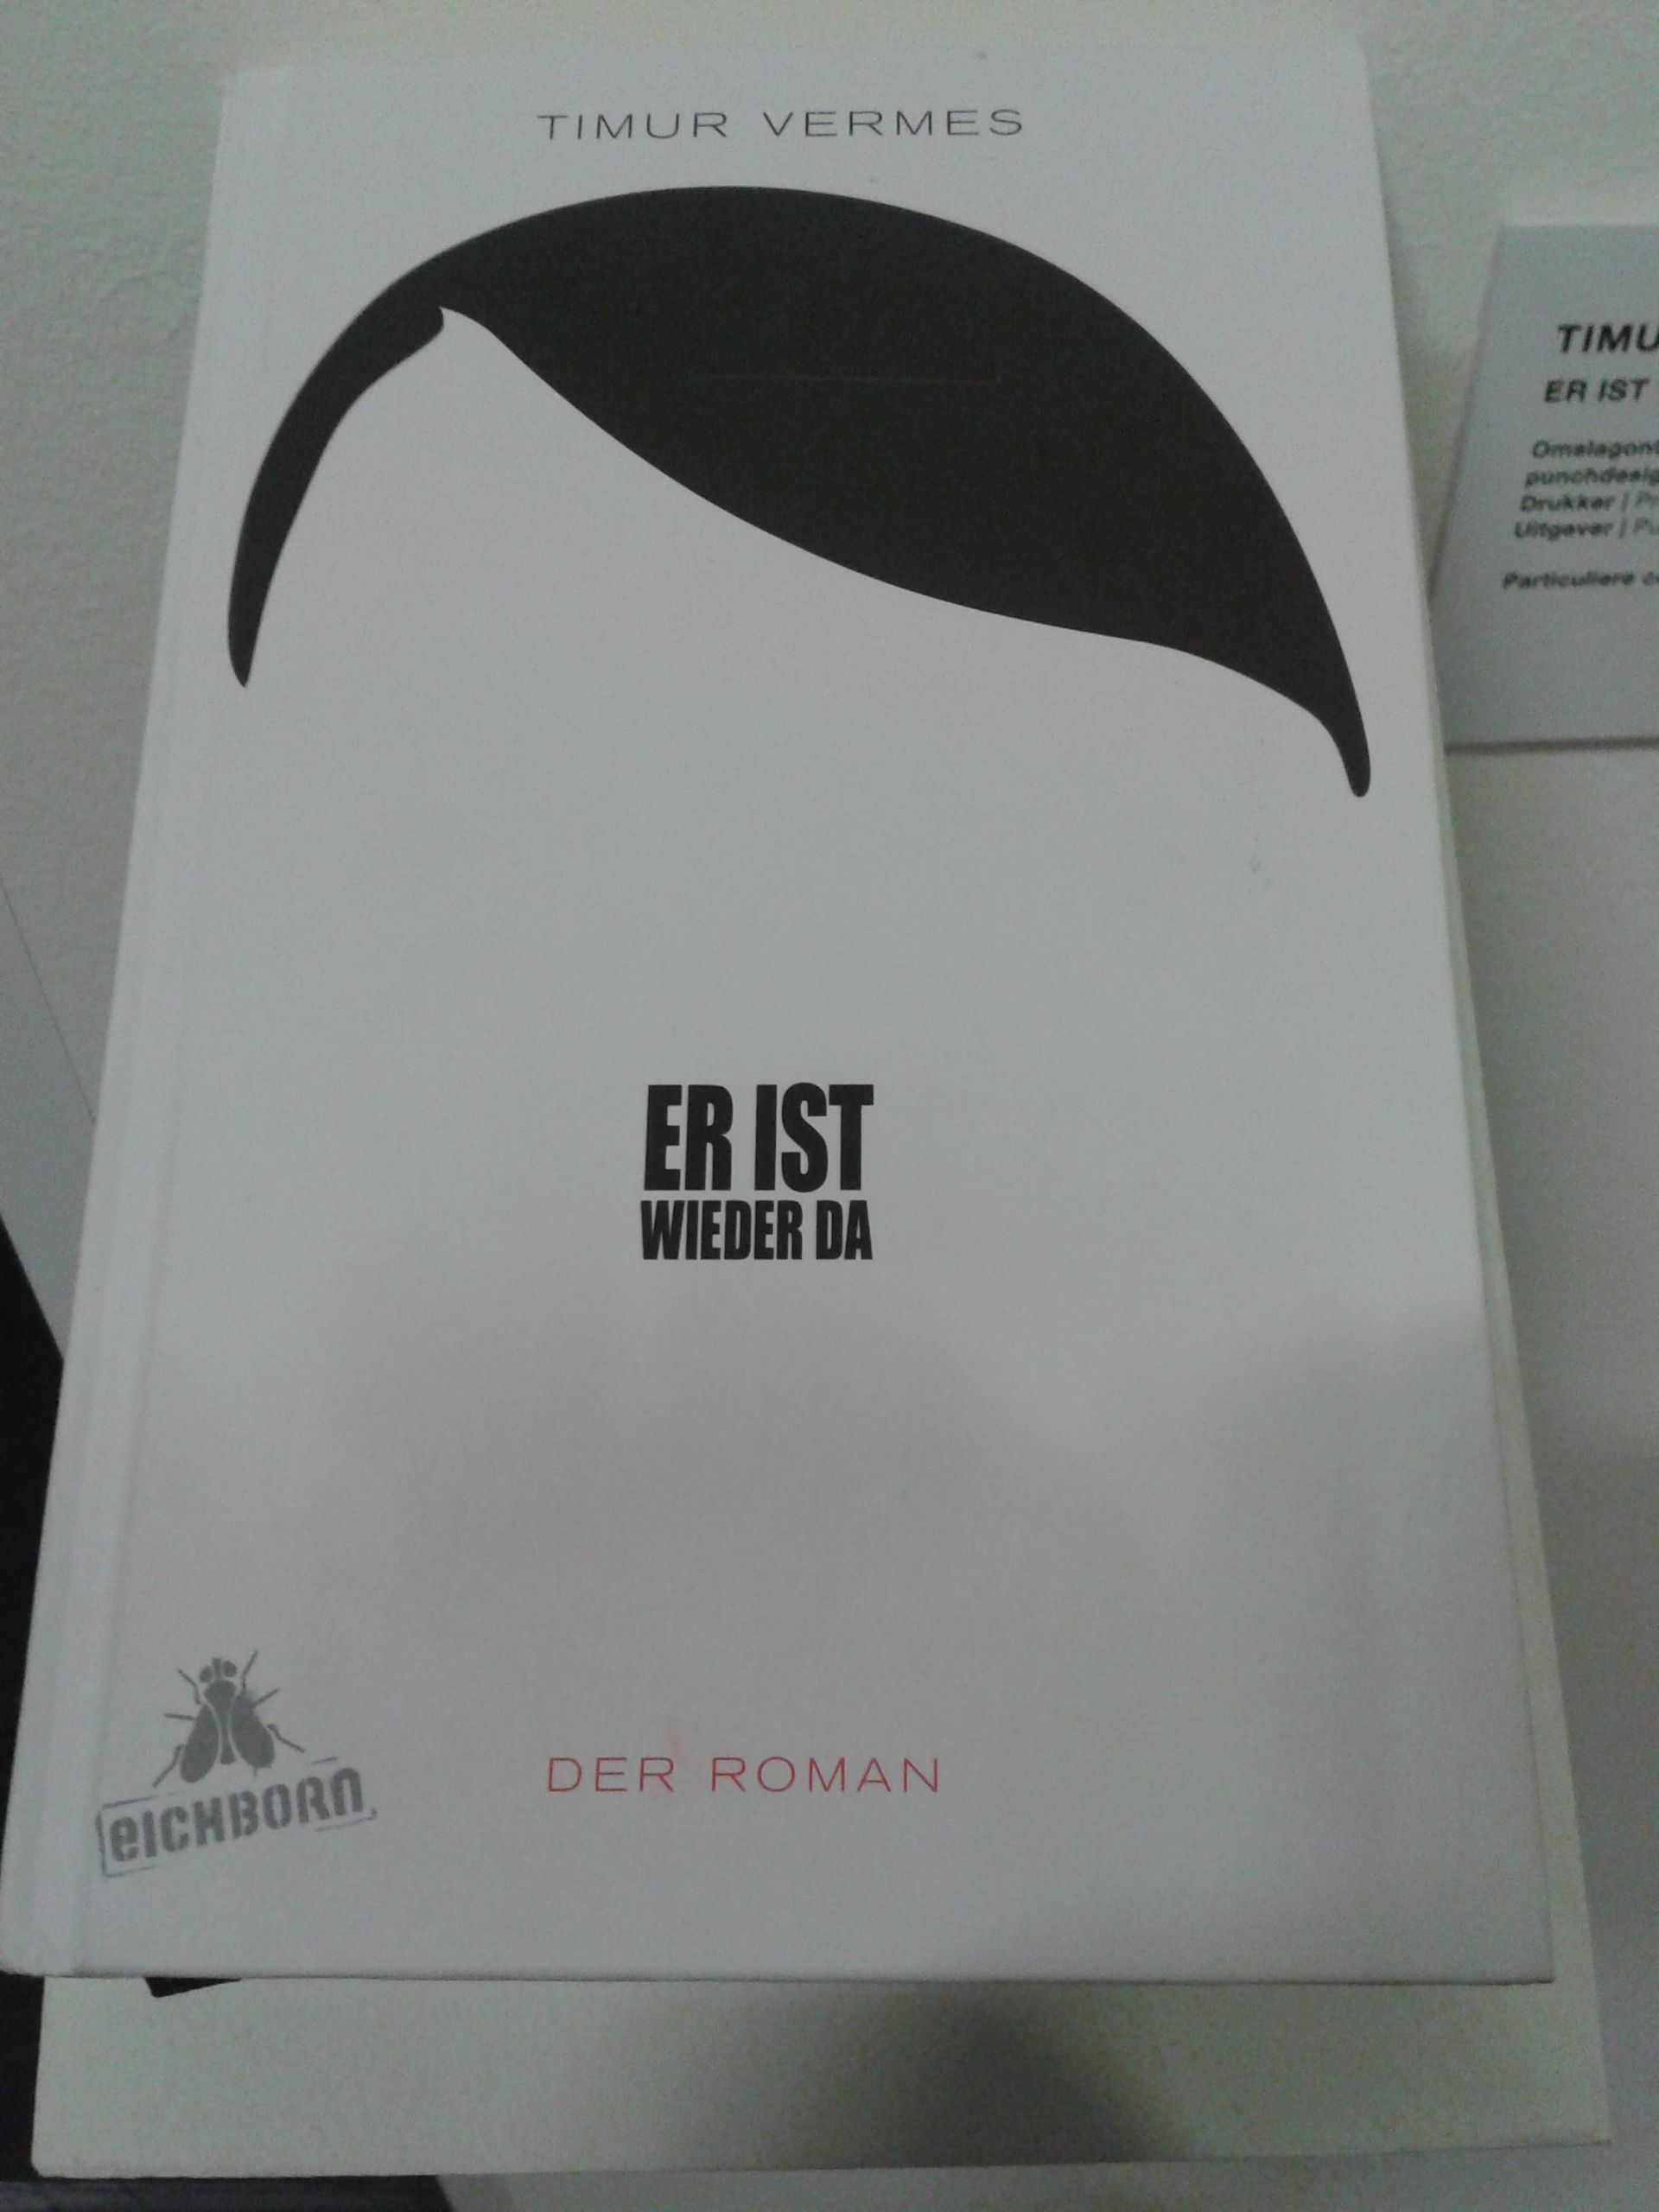 Er Ist Wieder Da book cover